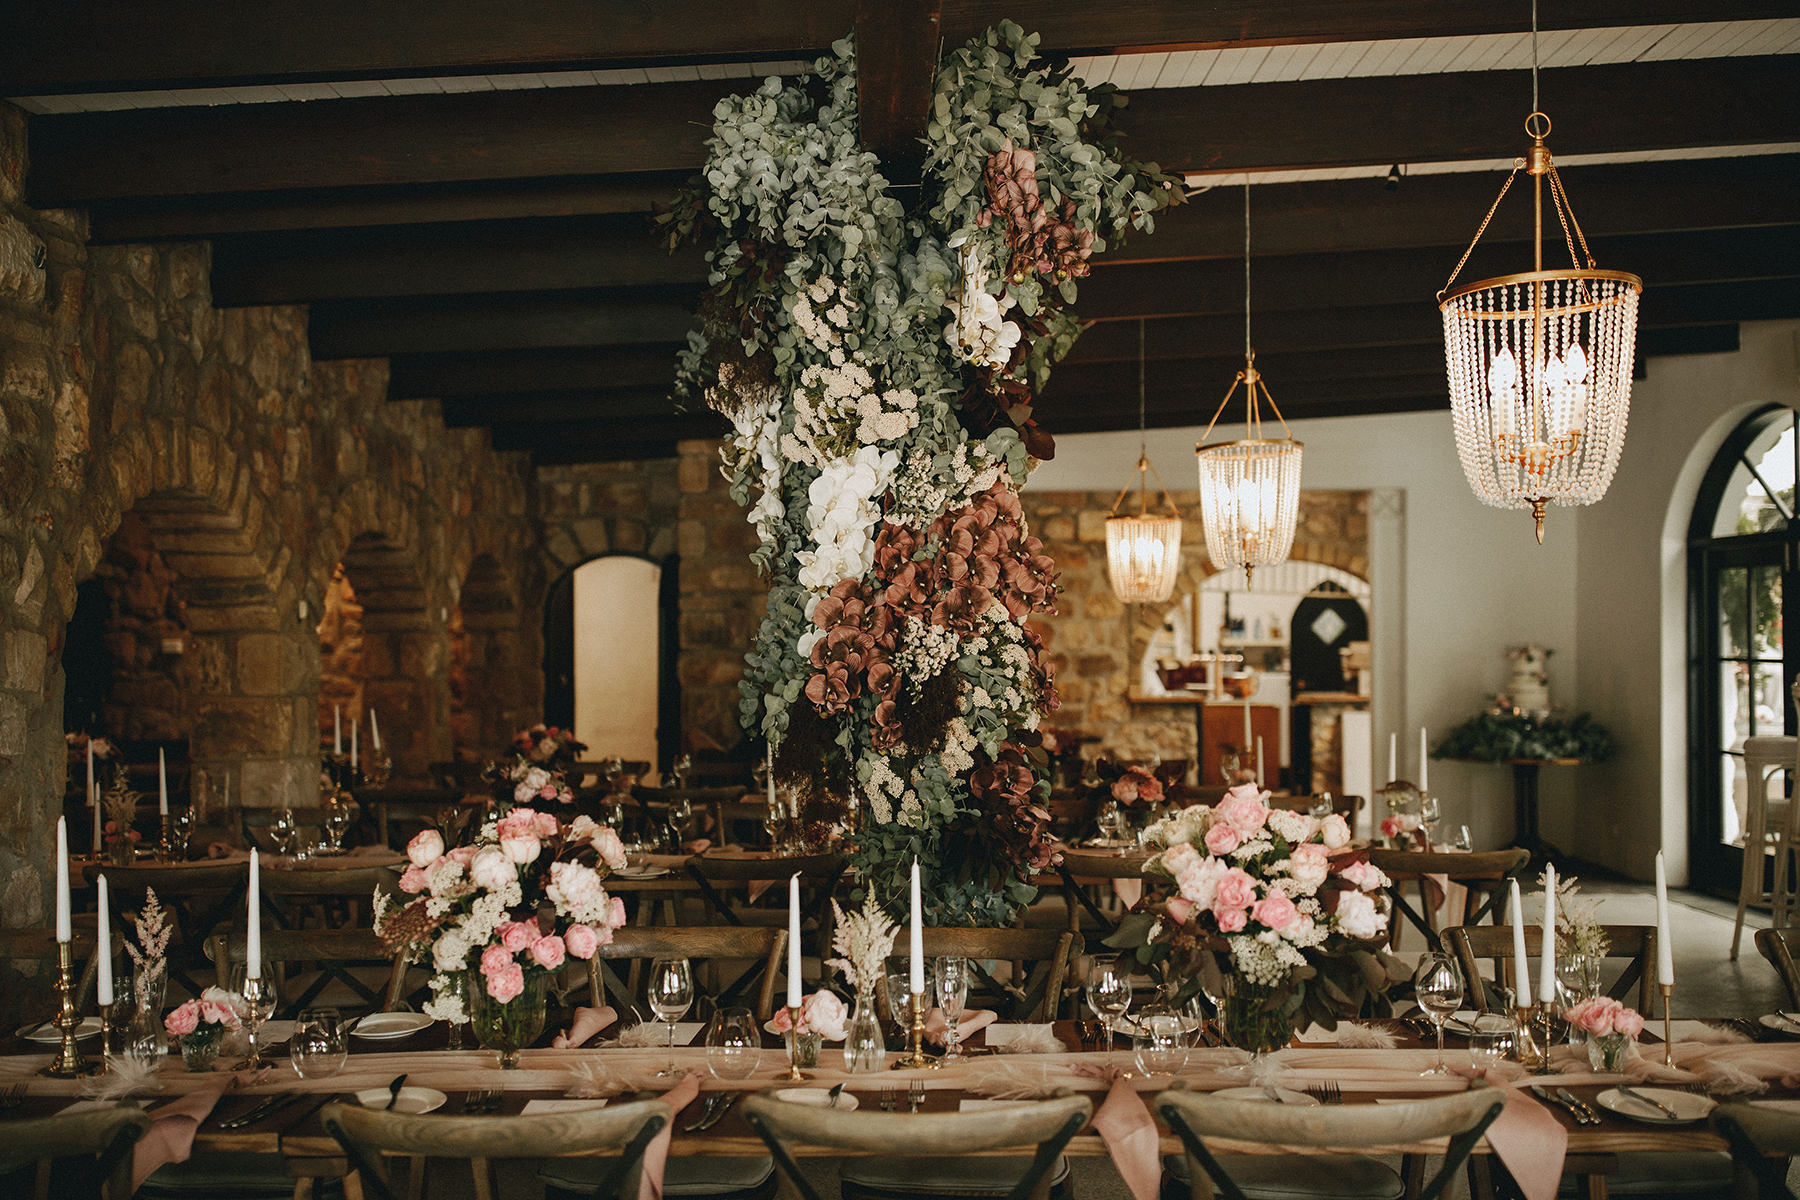 BYBHS_HYGGE_WEDDING_HUGH&GEORGIE_HI-RES_35.jpg